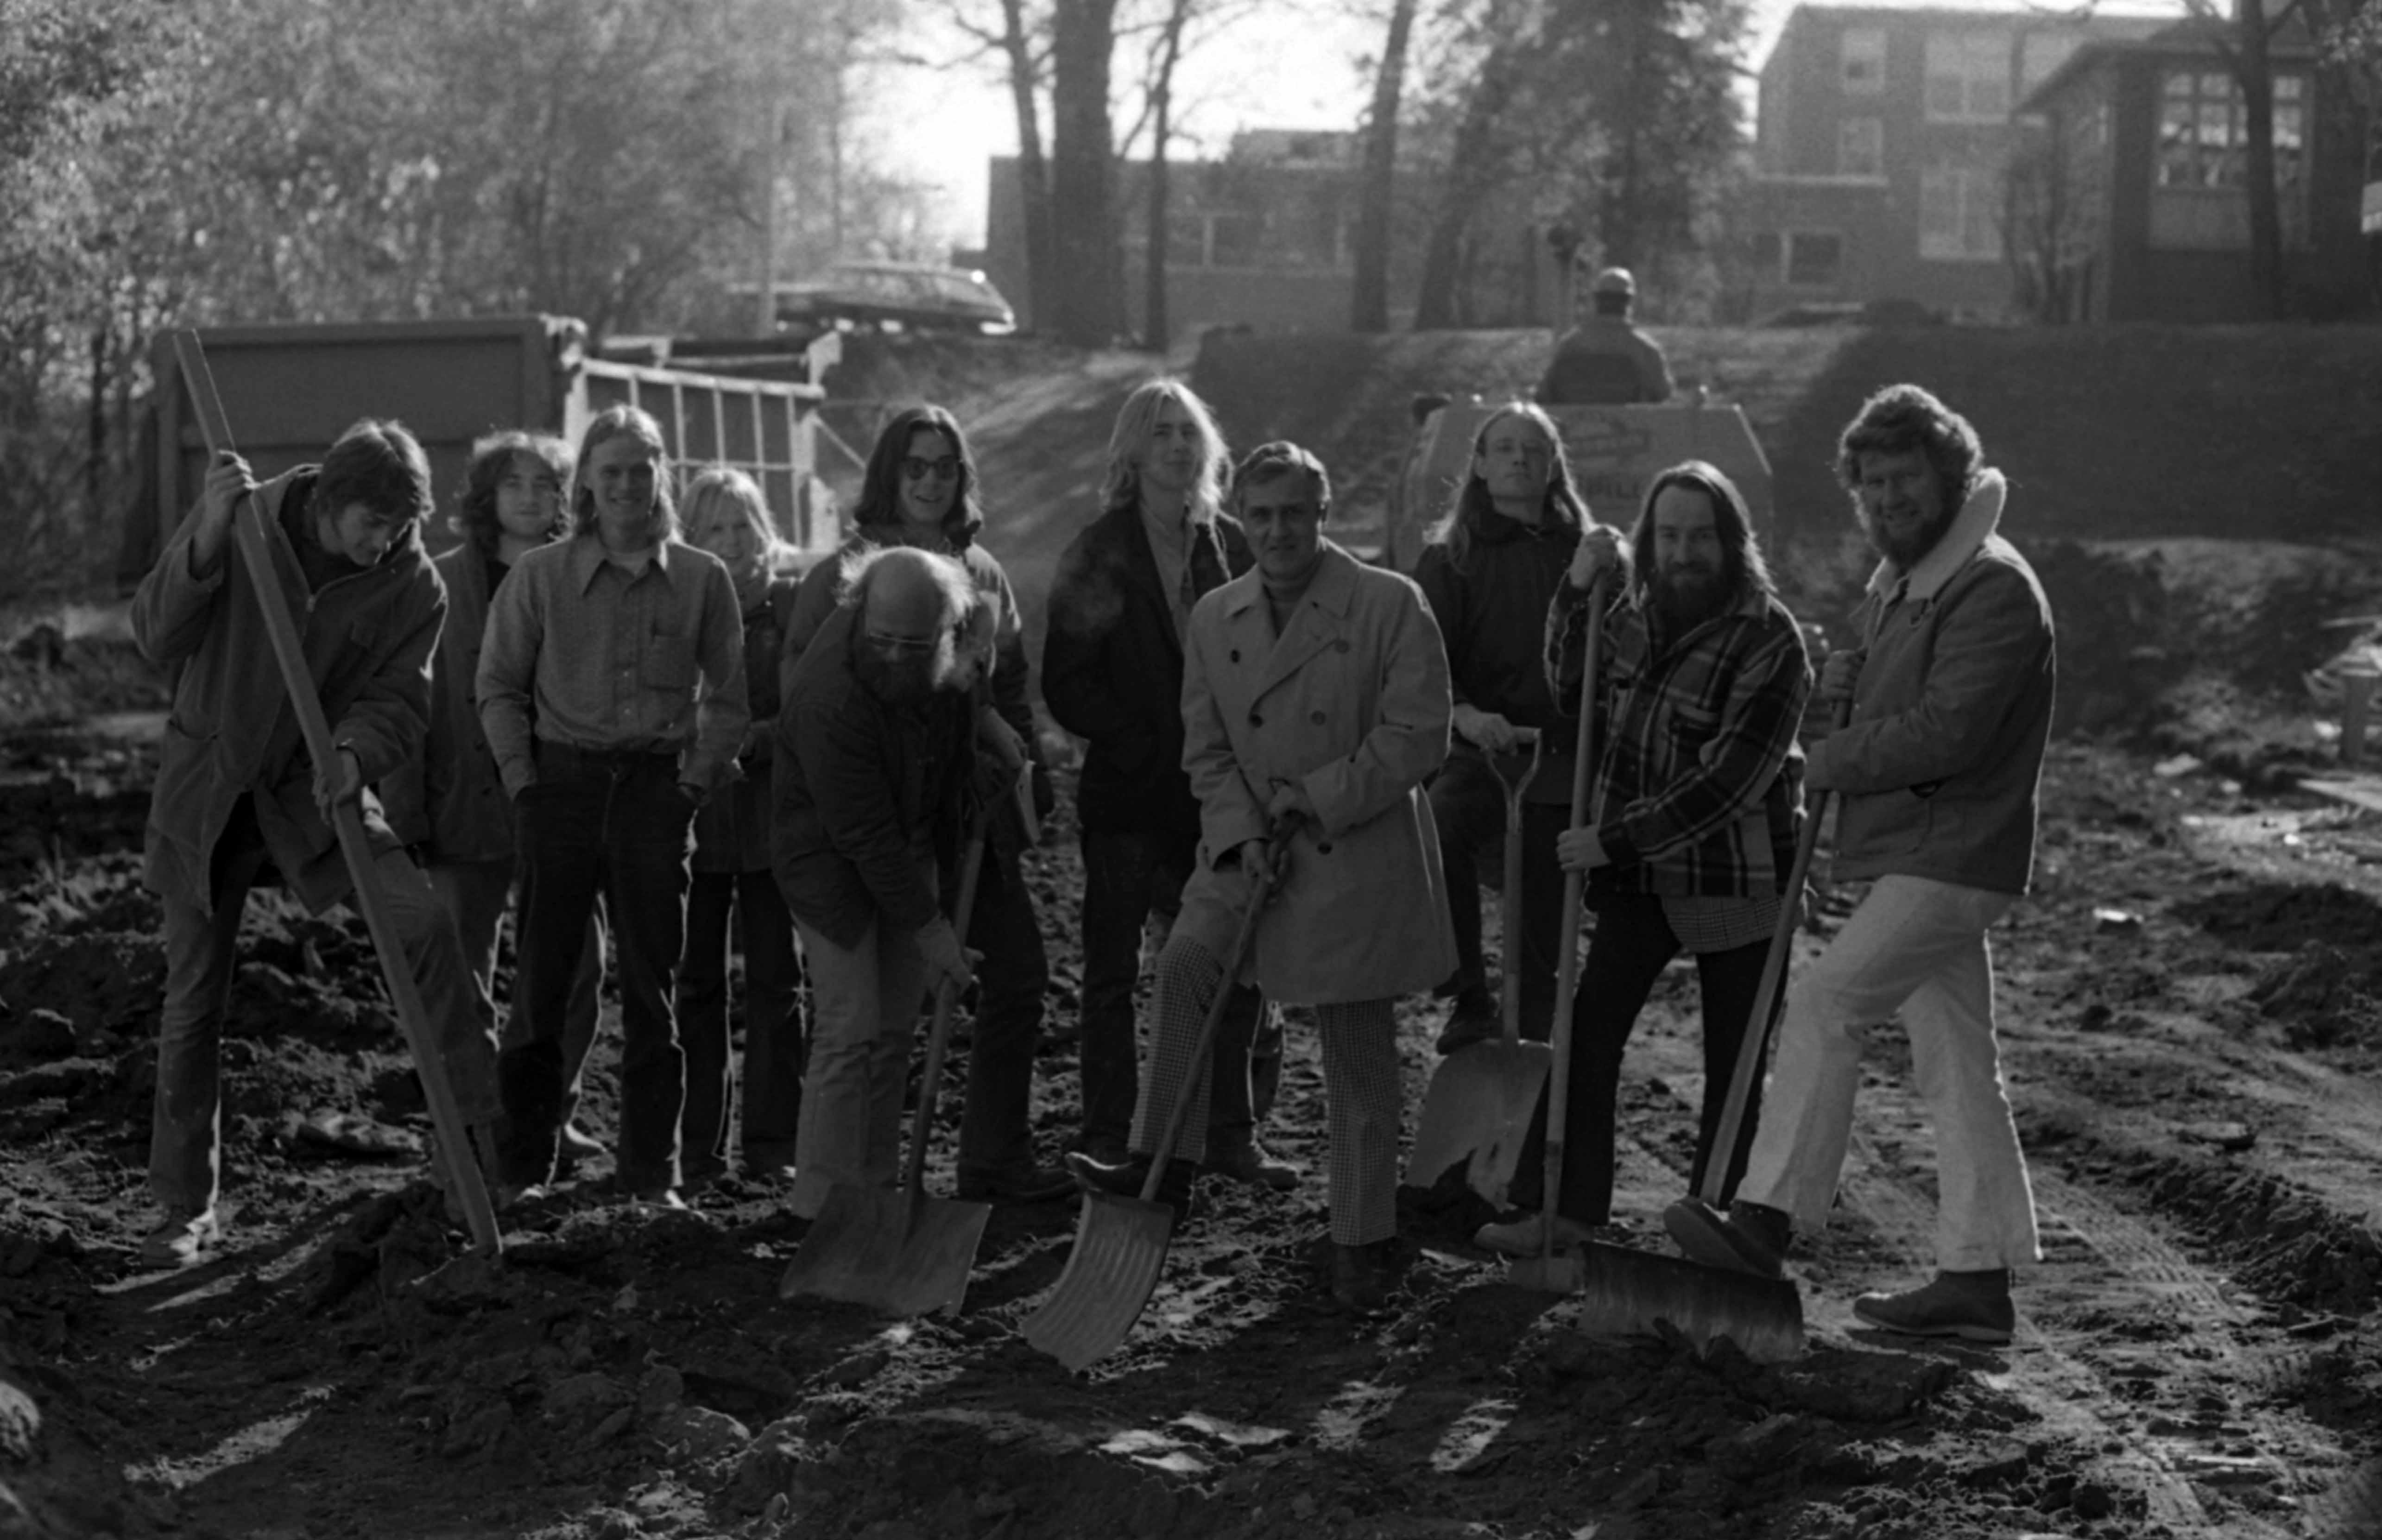 Unofficial Kiehle renovation groundbreaking, November 1973